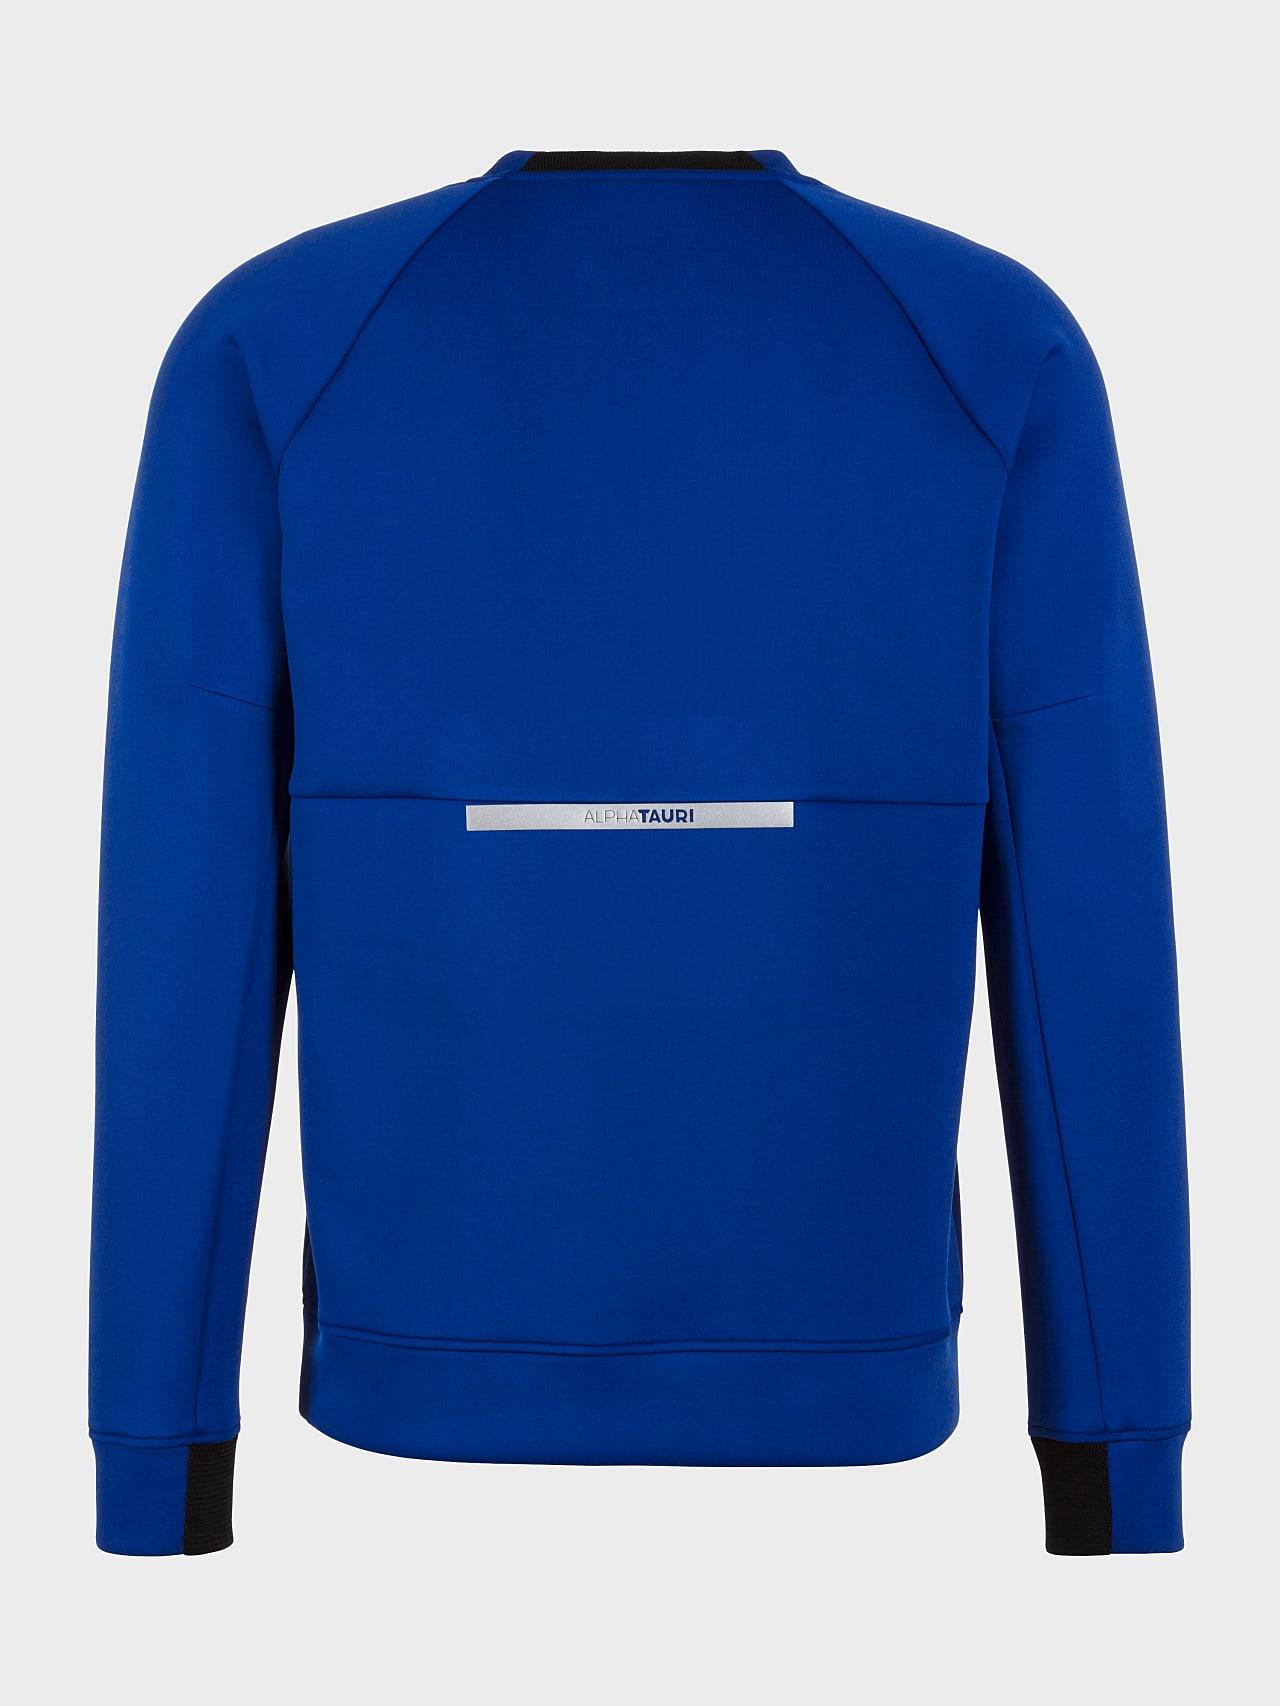 SUPRA V3.Y5.01 Technical Crewneck Sweater blue Left Alpha Tauri